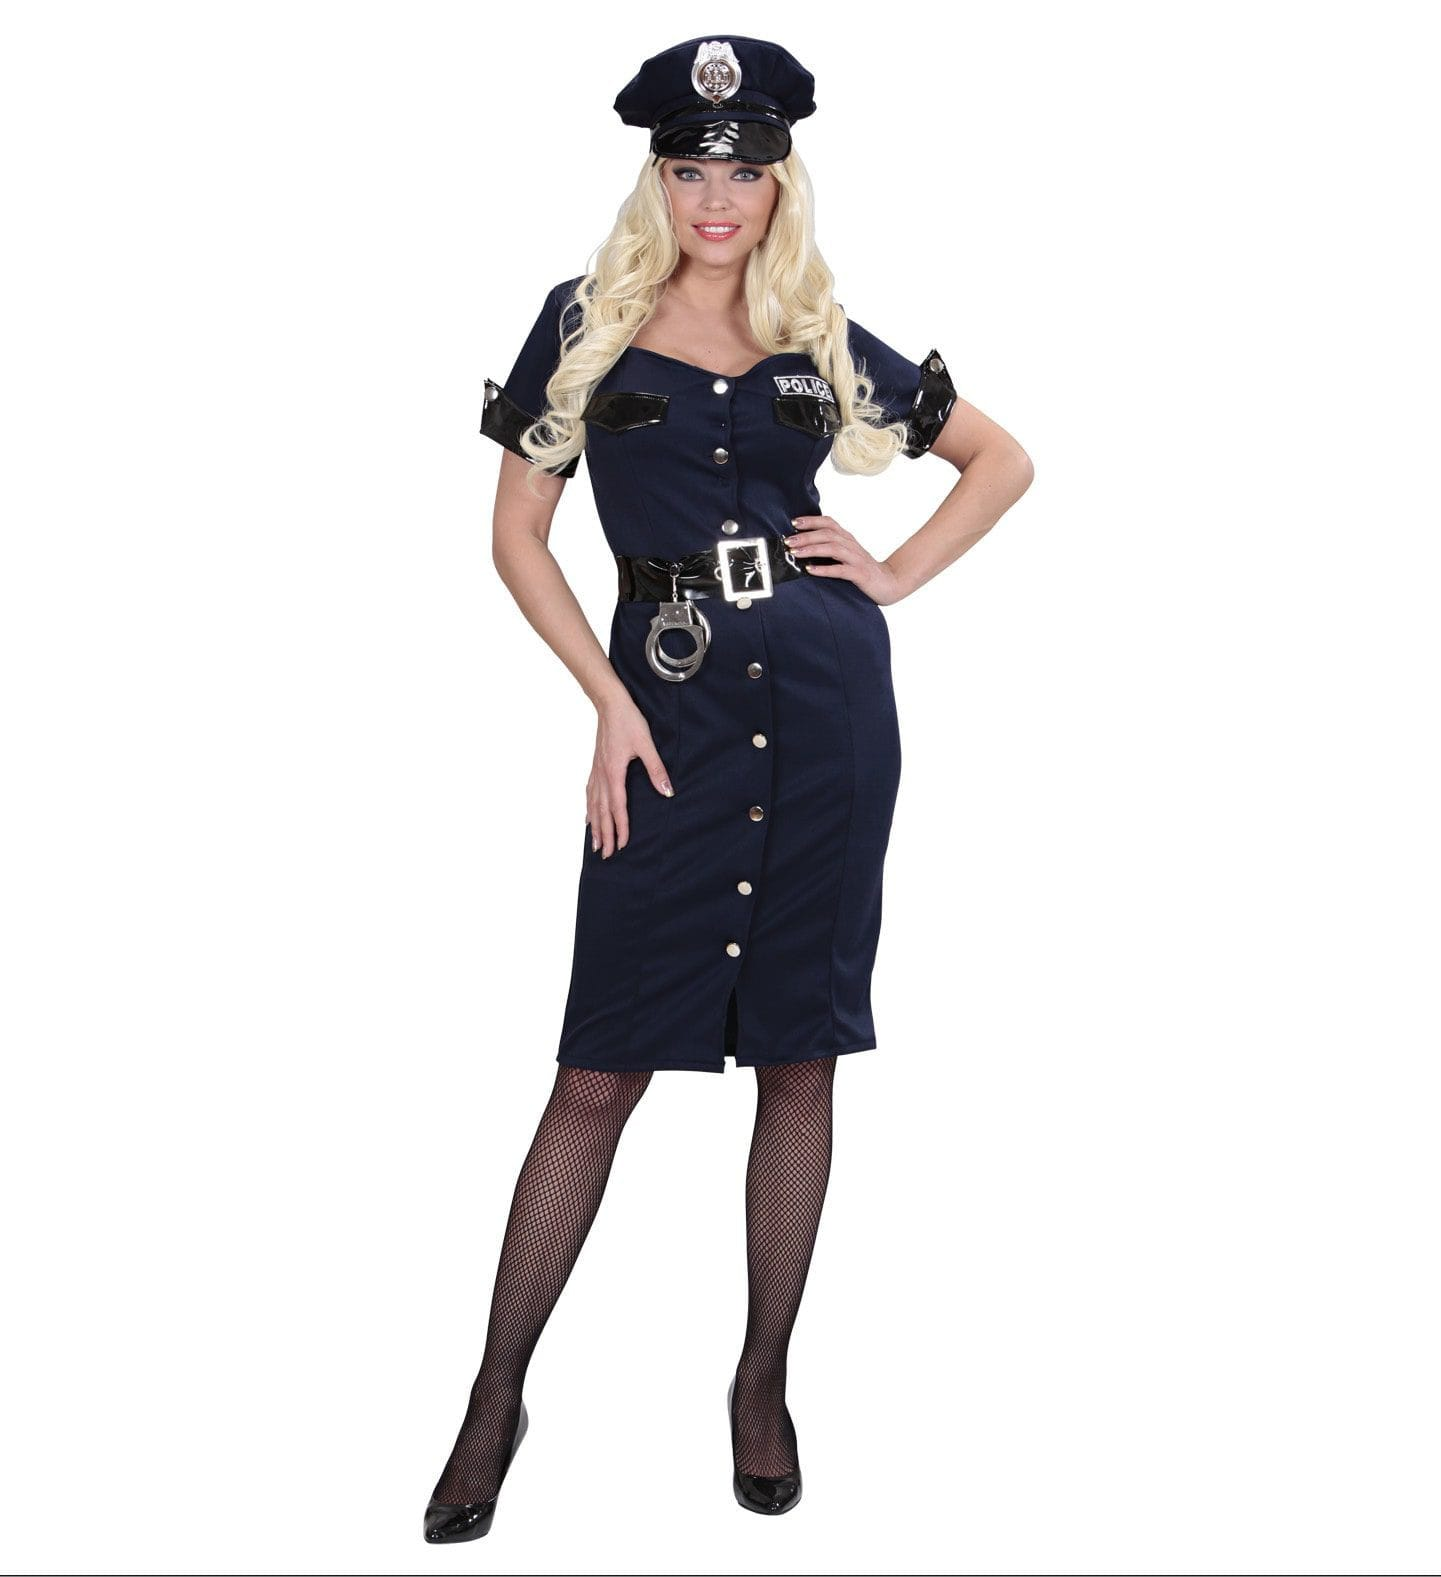 Patente Politie Meisje Lang Vrouw Kostuum